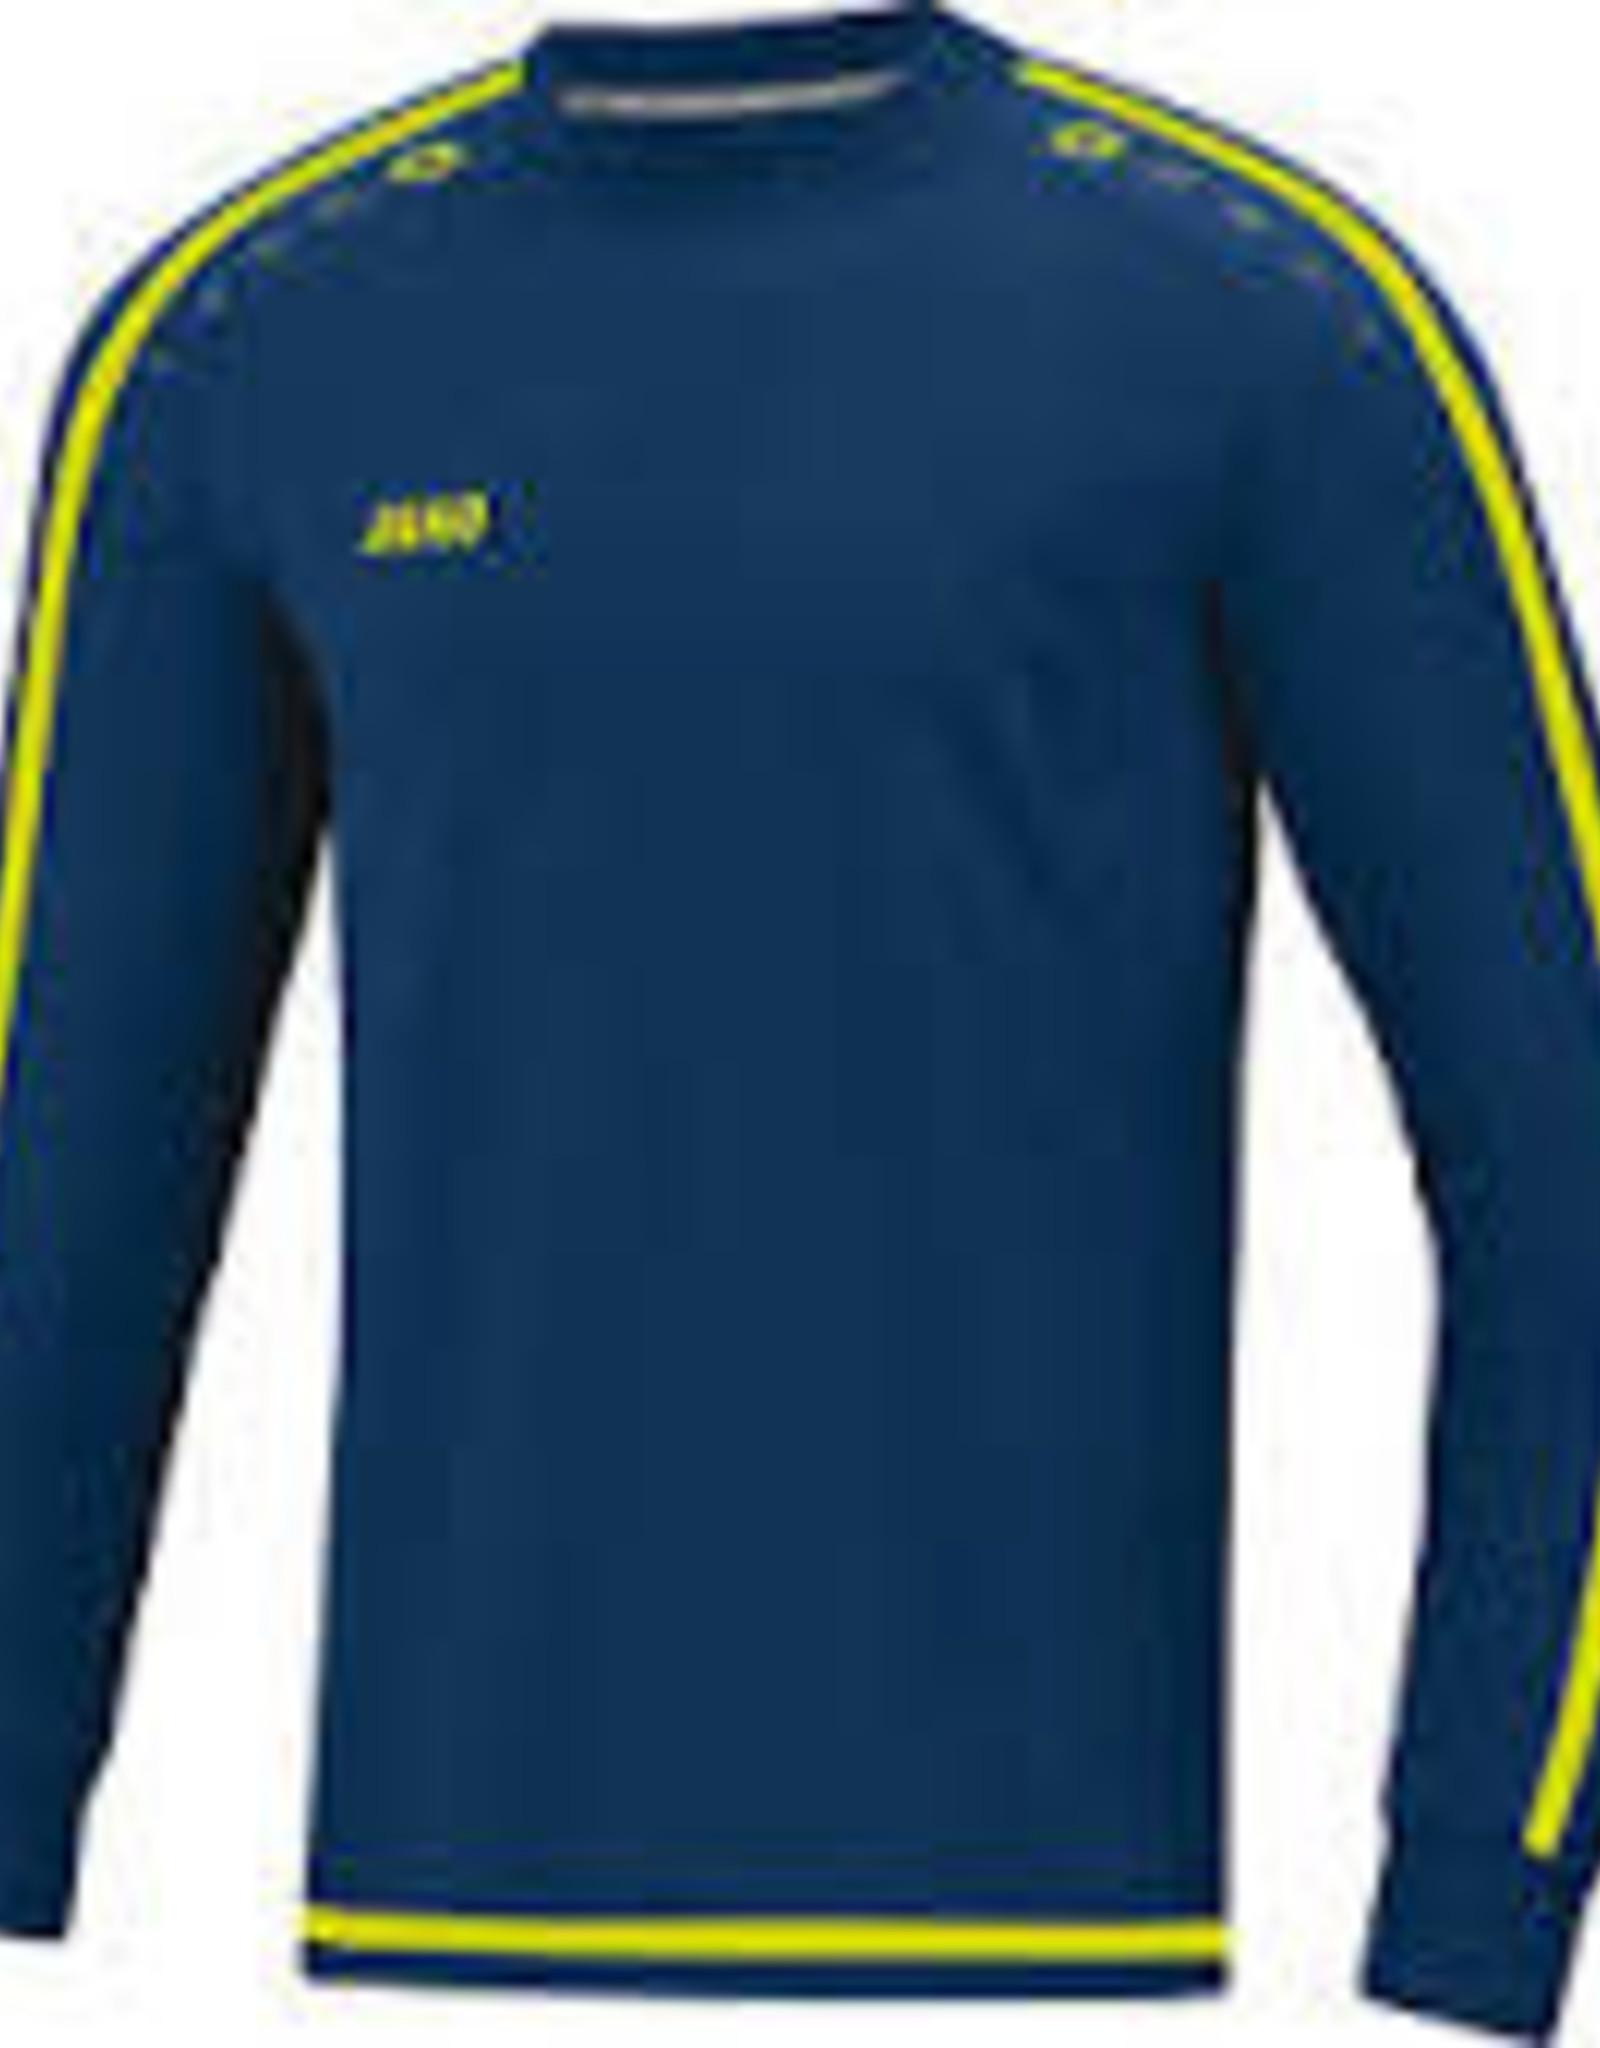 keepershirt Striker 2.0